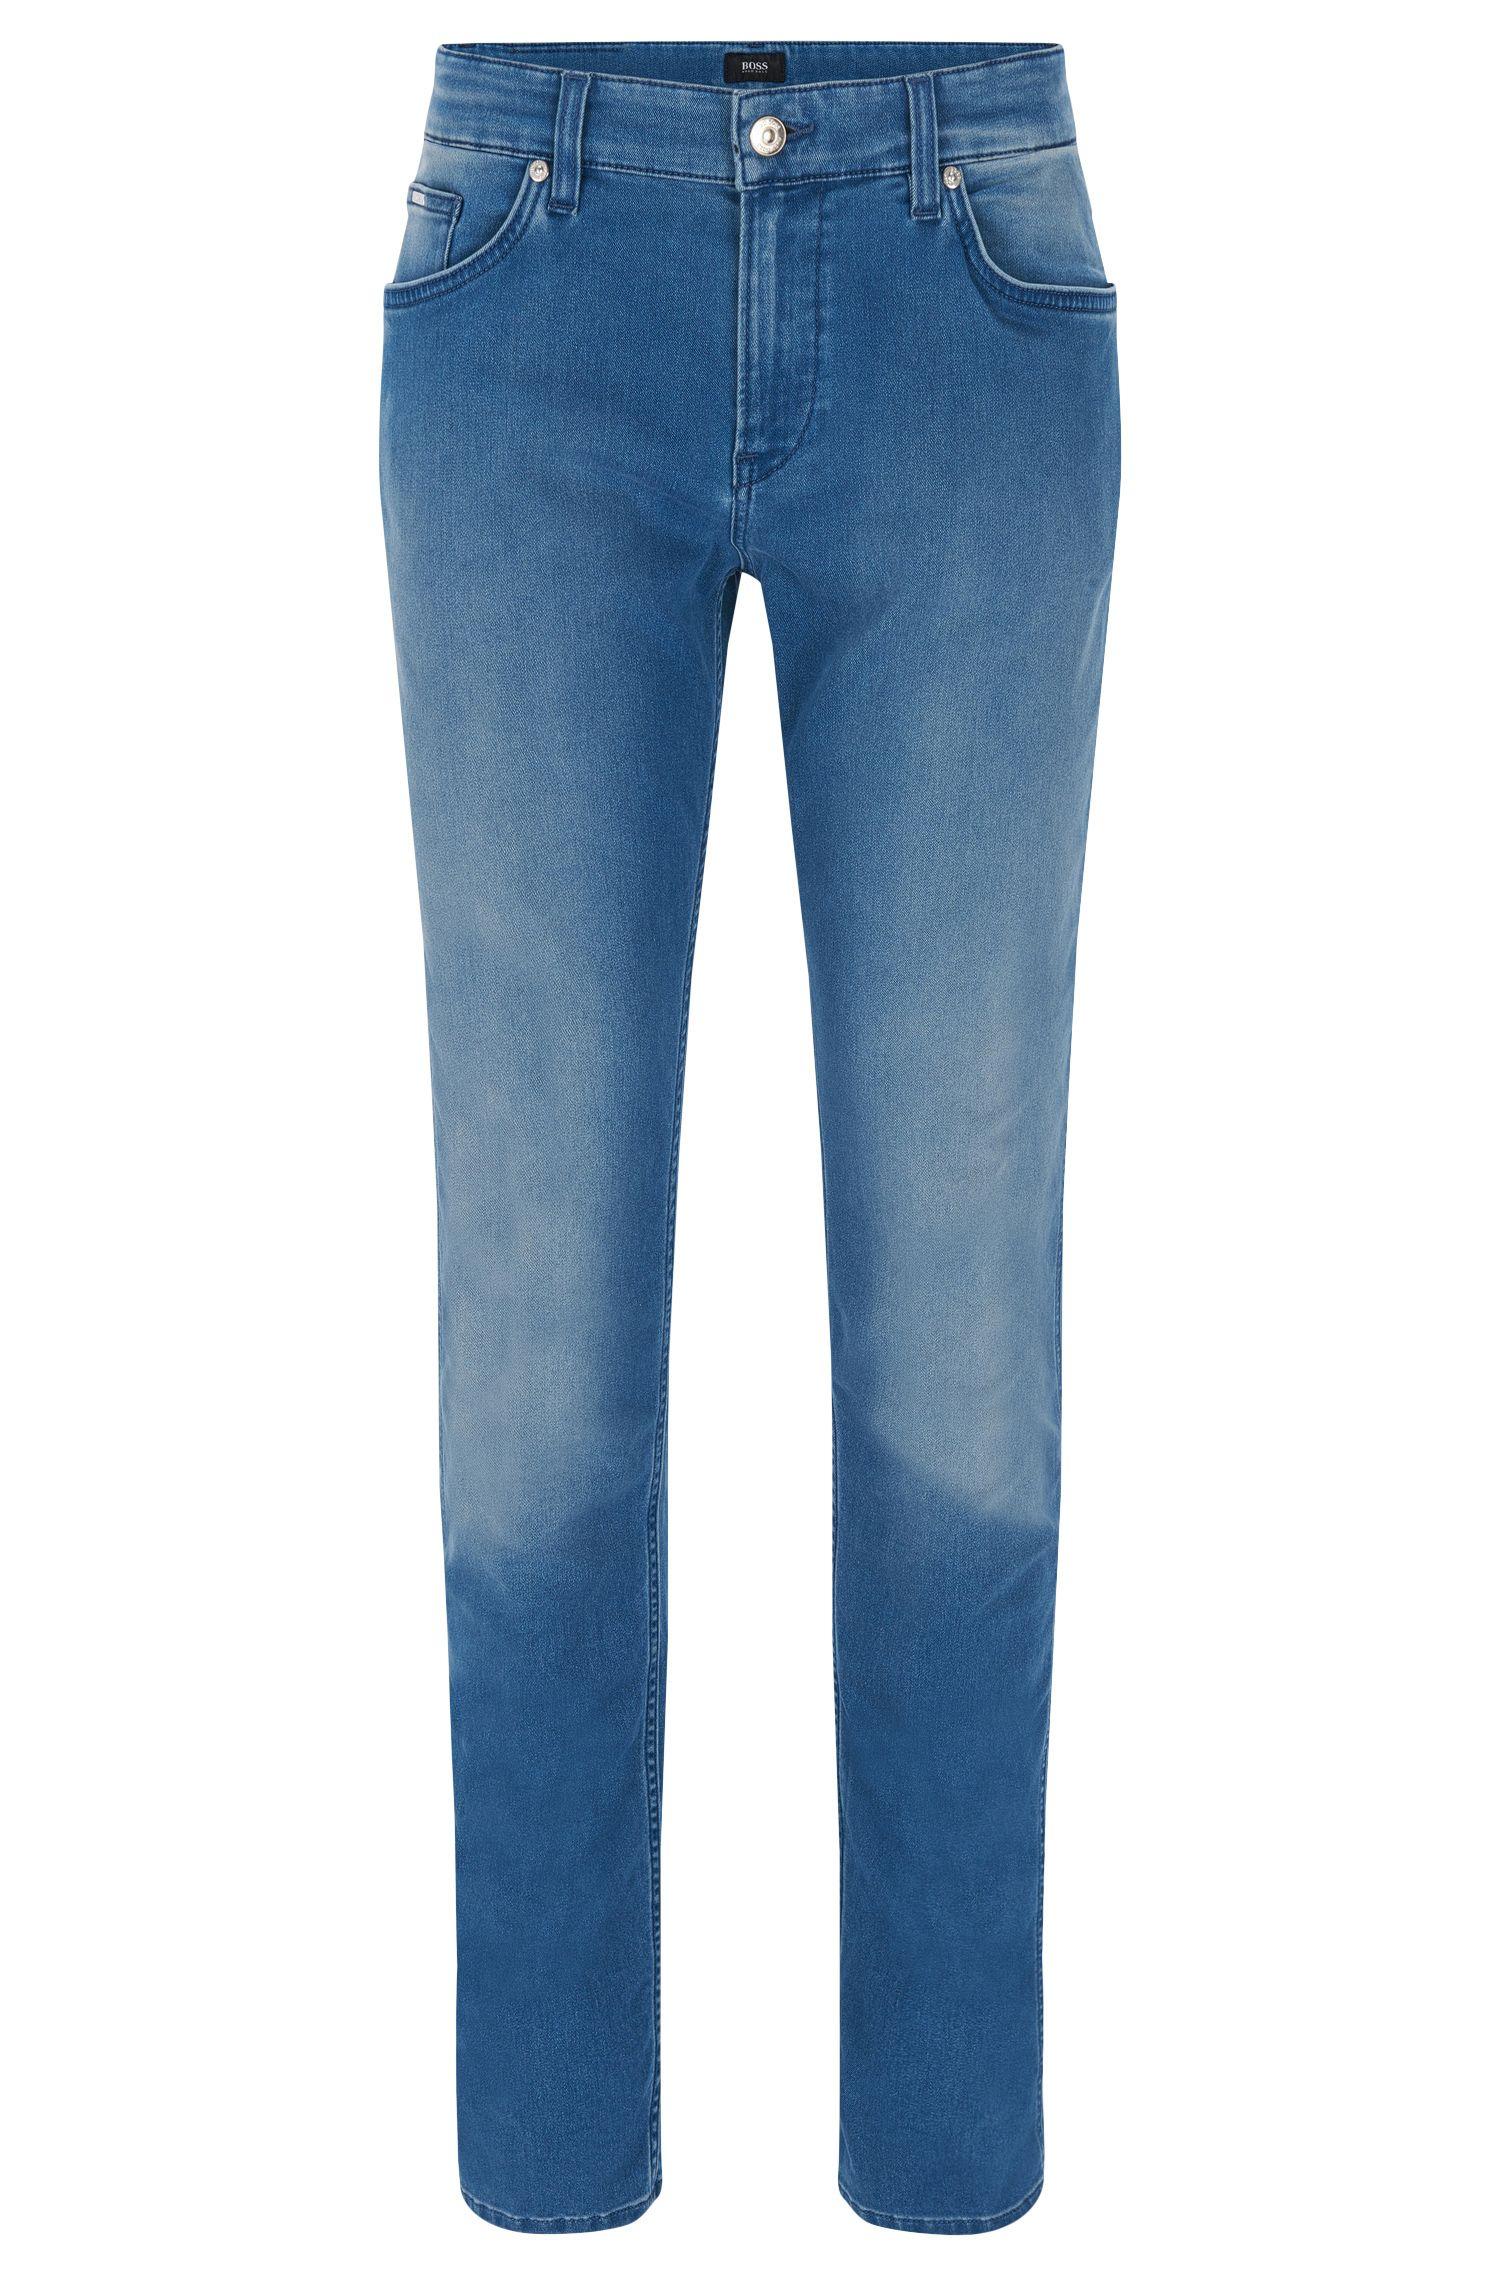 8 oz Stretch Cotton Blend Jeans, Slim Fit | Delaware